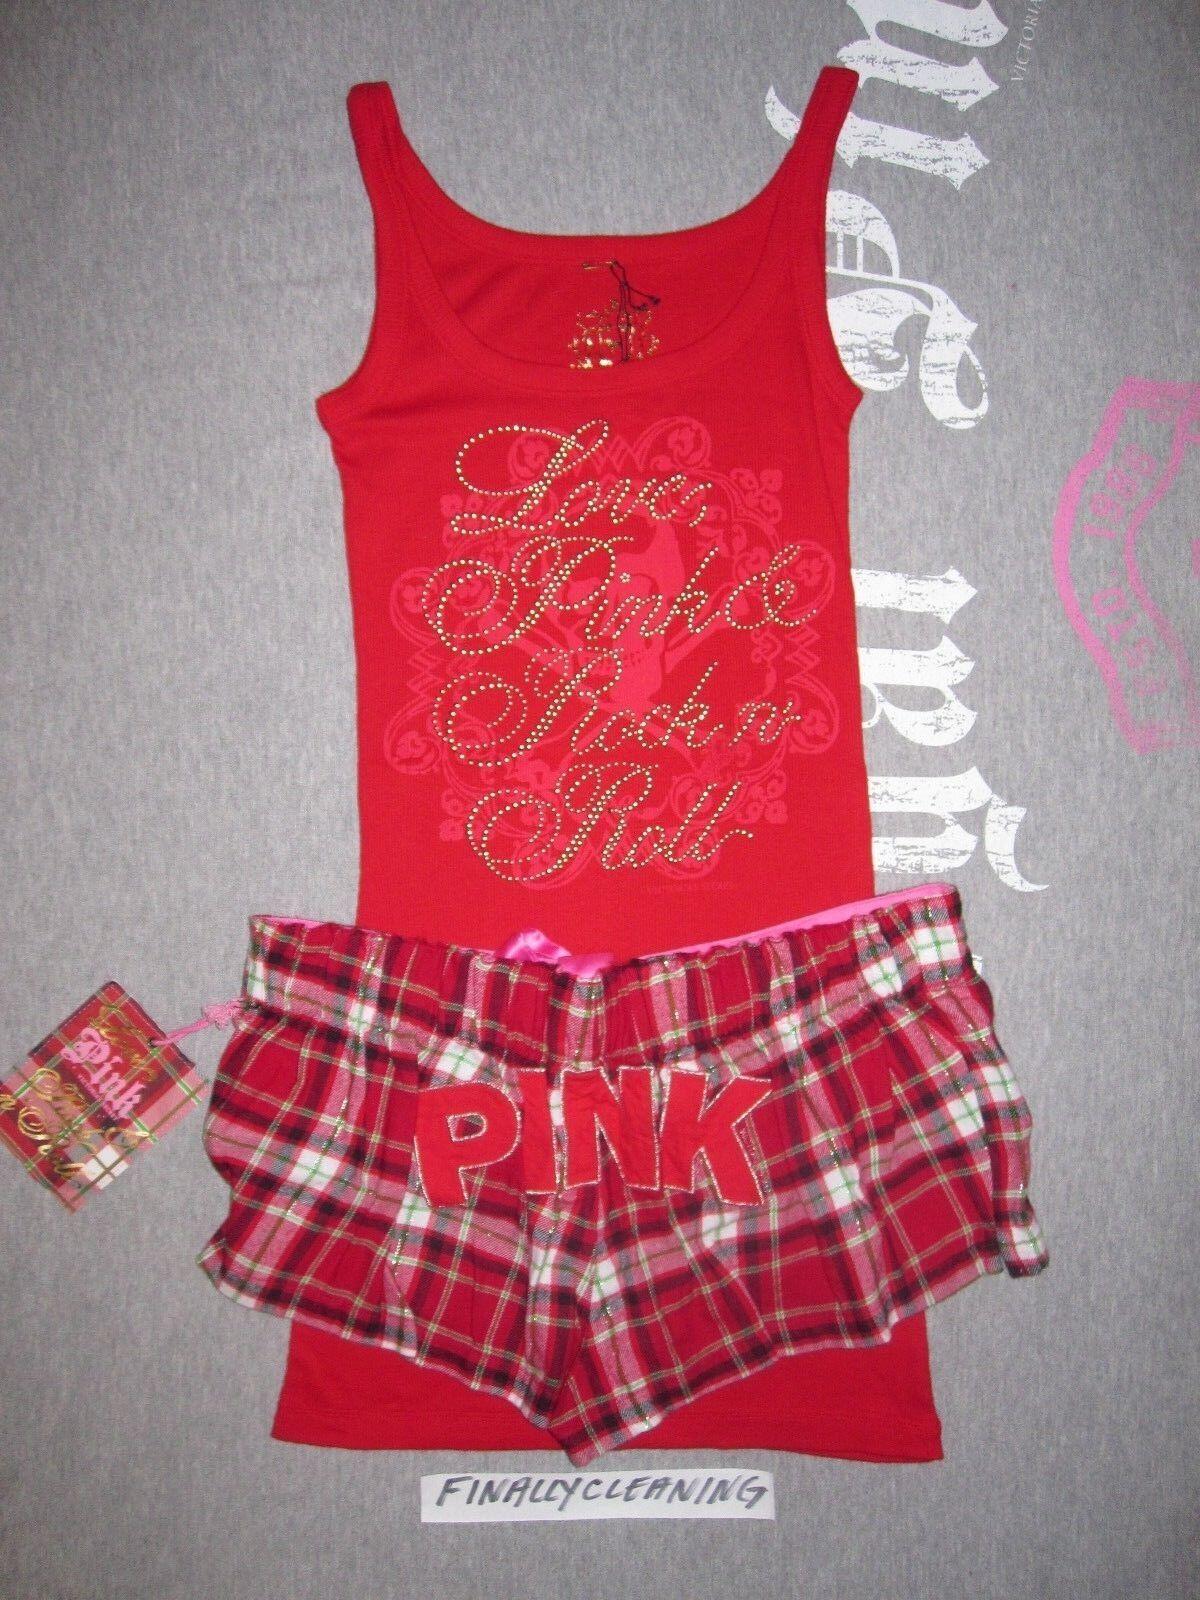 NWT Victoria's Secret PINK vintage tank top plaid boxer pajama gift set XS S